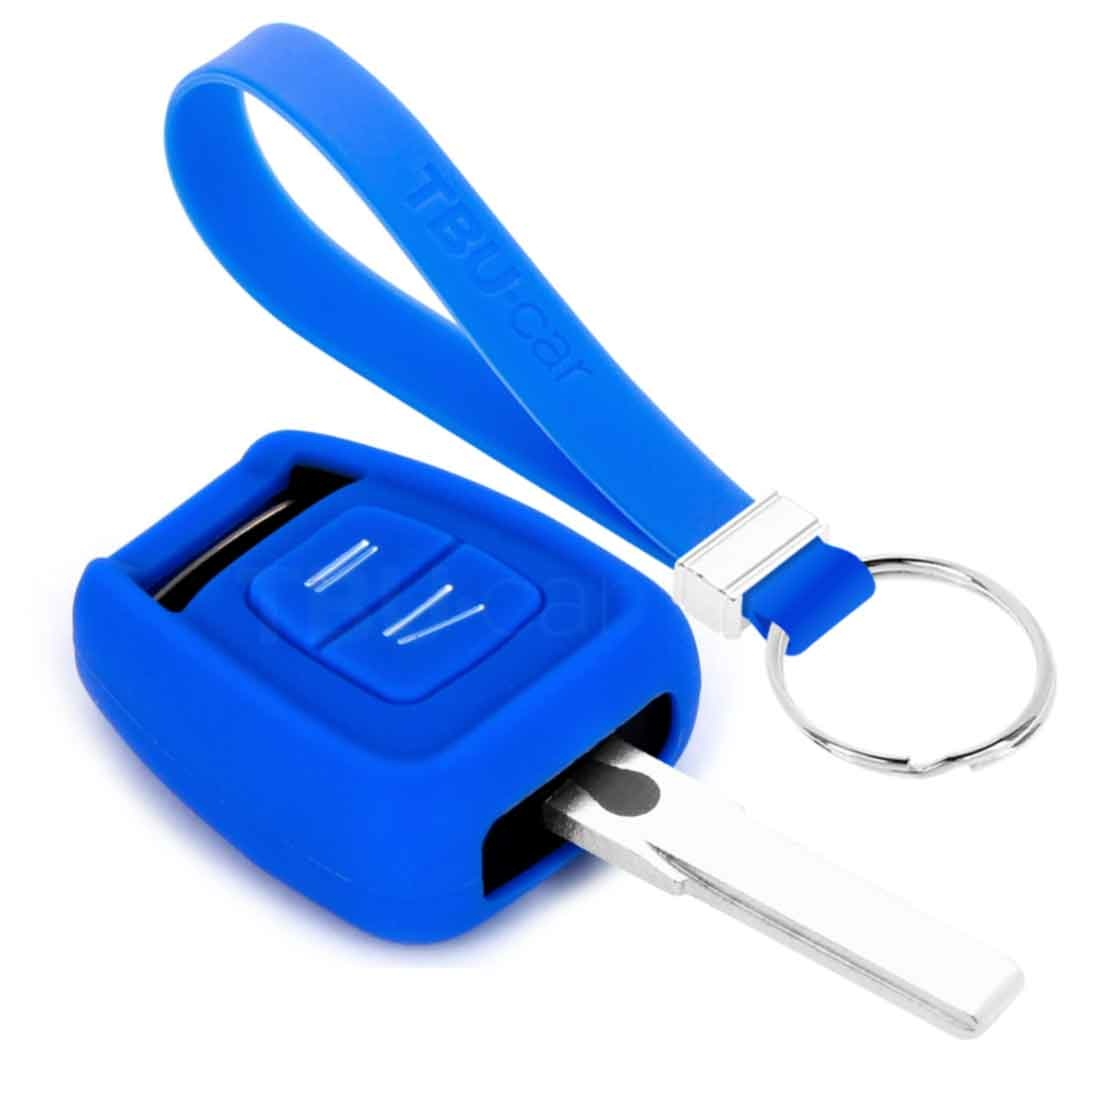 TBU car TBU car Autoschlüssel Hülle kompatibel mit Vauxhall 2 Tasten - Schutzhülle aus Silikon - Auto Schlüsselhülle Cover in Blau